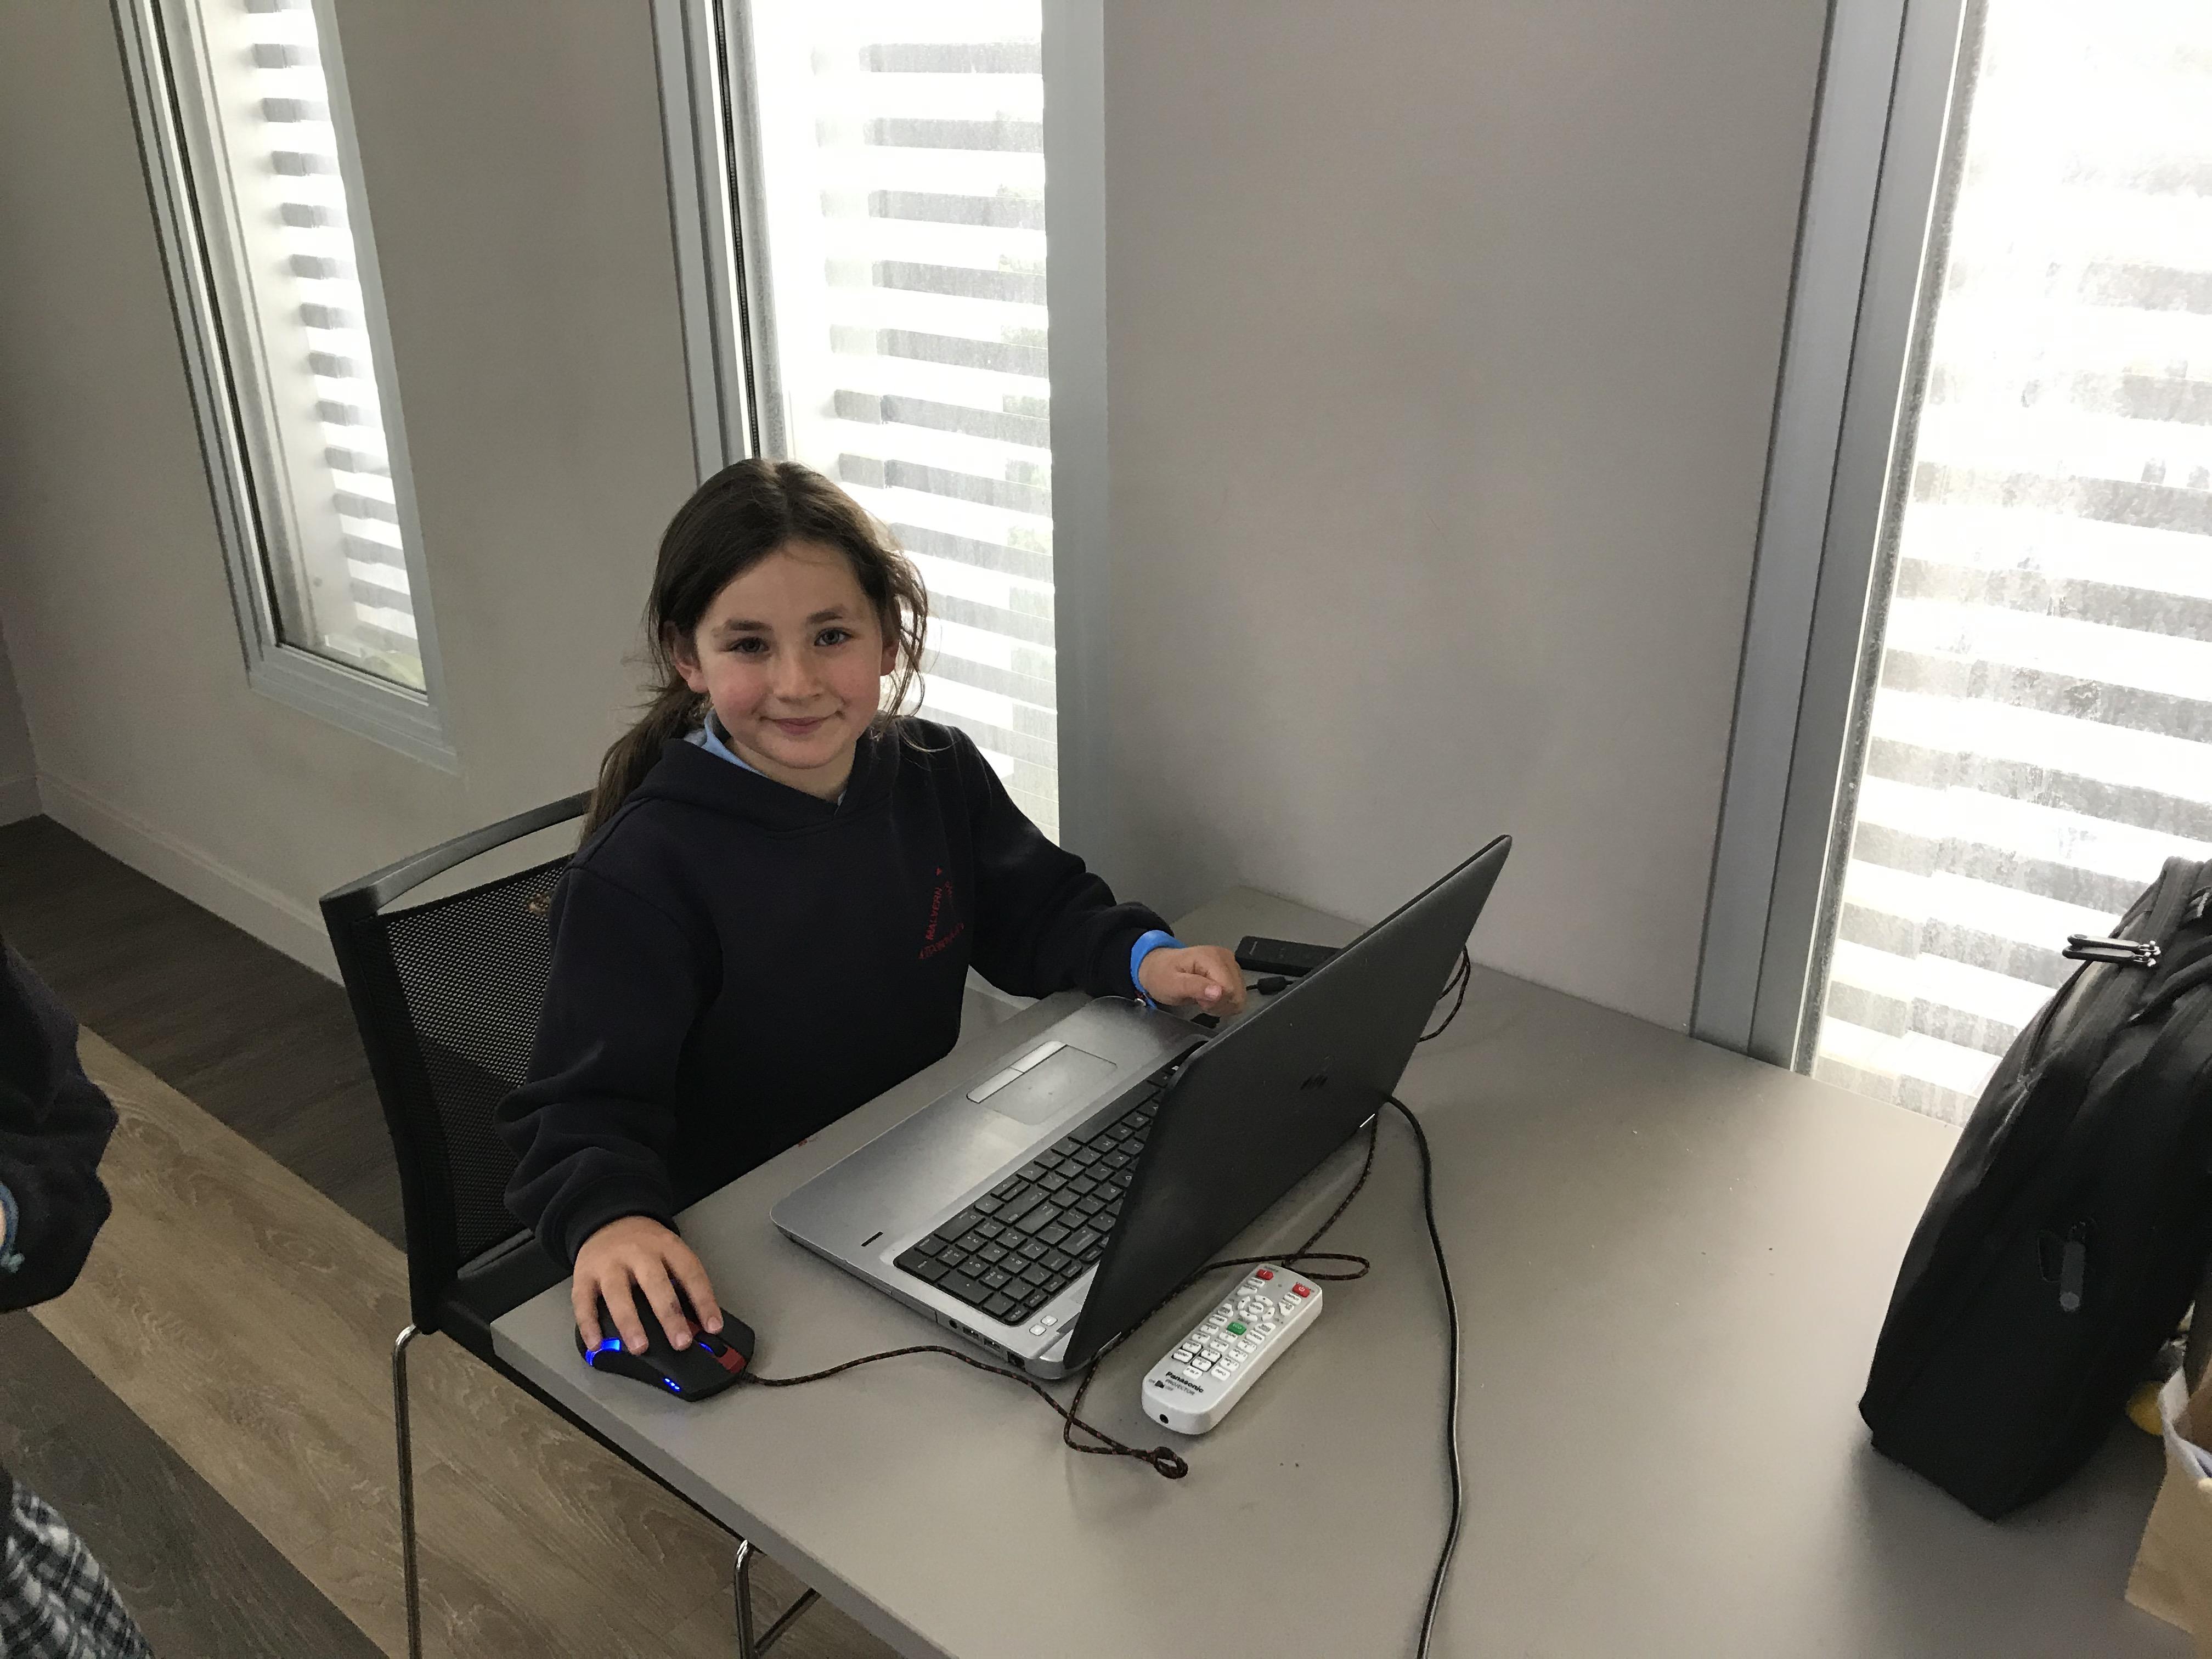 Alexis Helfenbaum Grade 3 Chabad Malvern